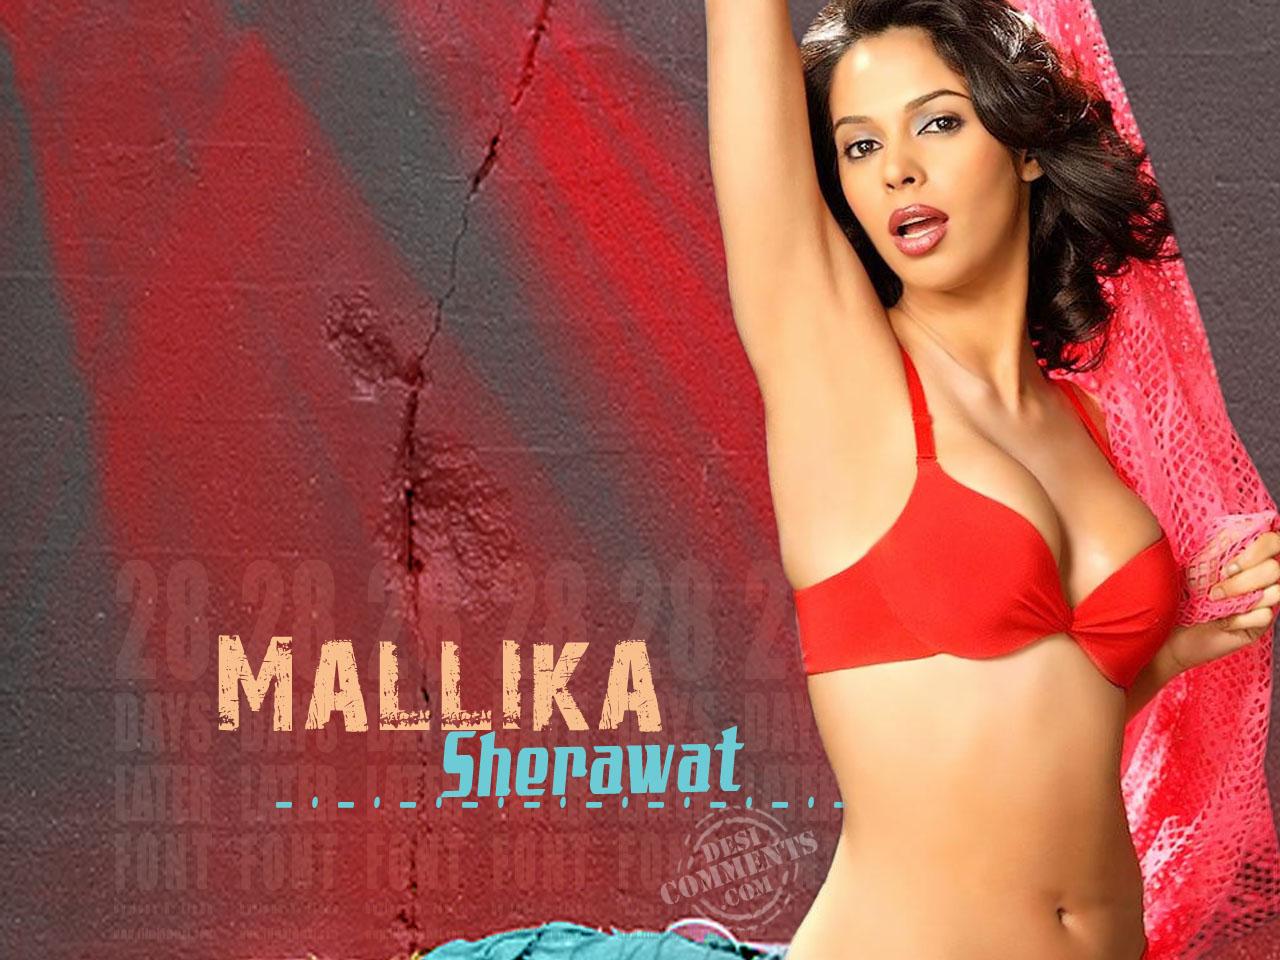 Hot Hot Images Bollywood Mallika Sherawat All Latest -6047